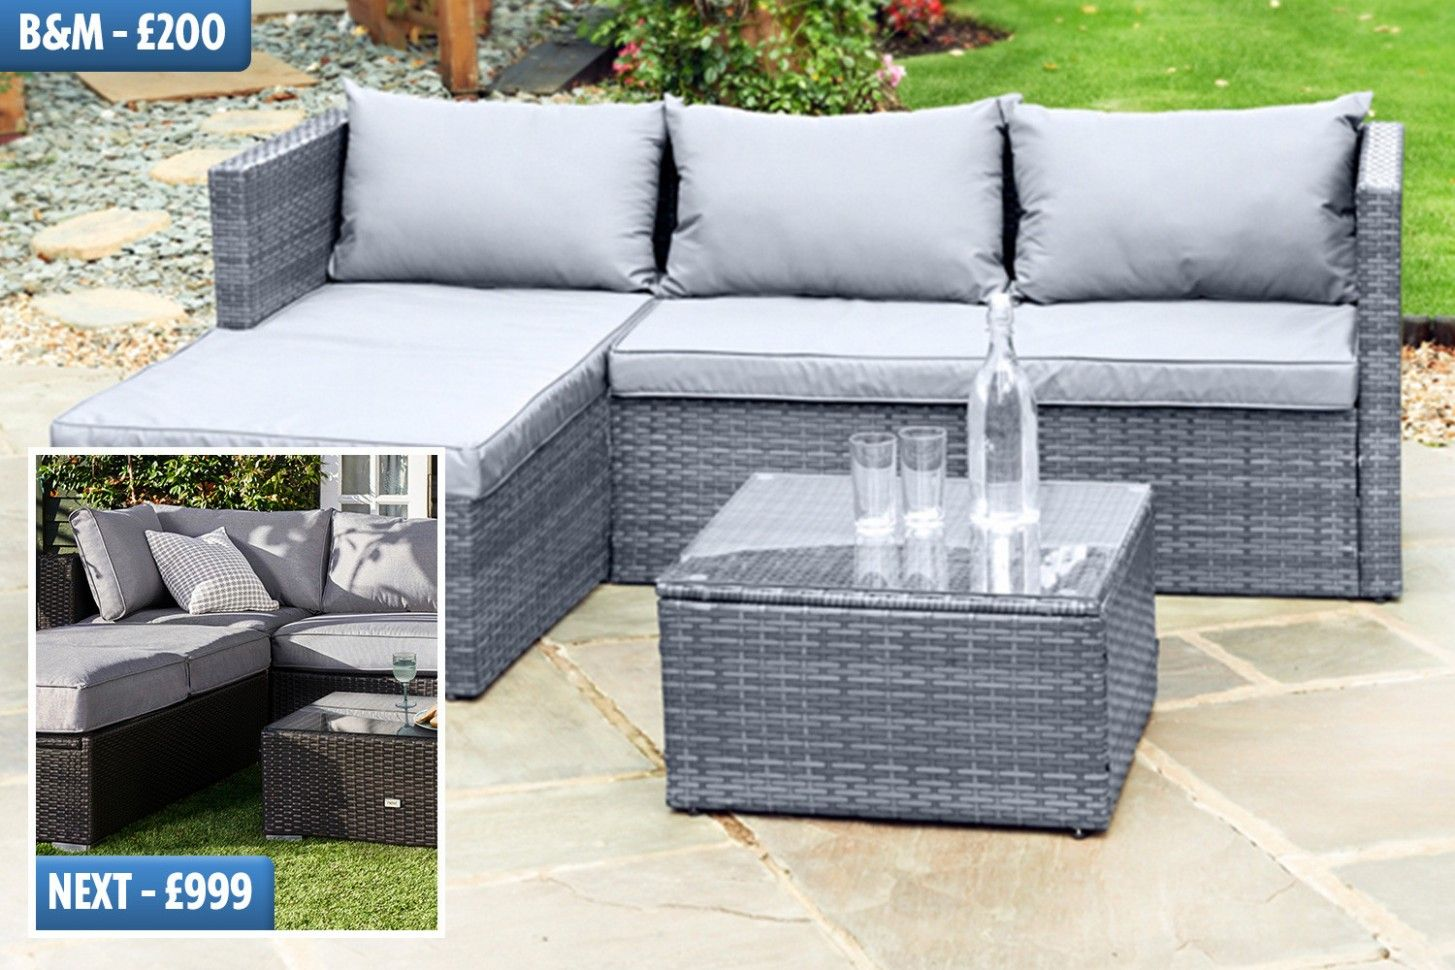 Next Day Delivery Garden Sofa in 6  Cheap garden furniture